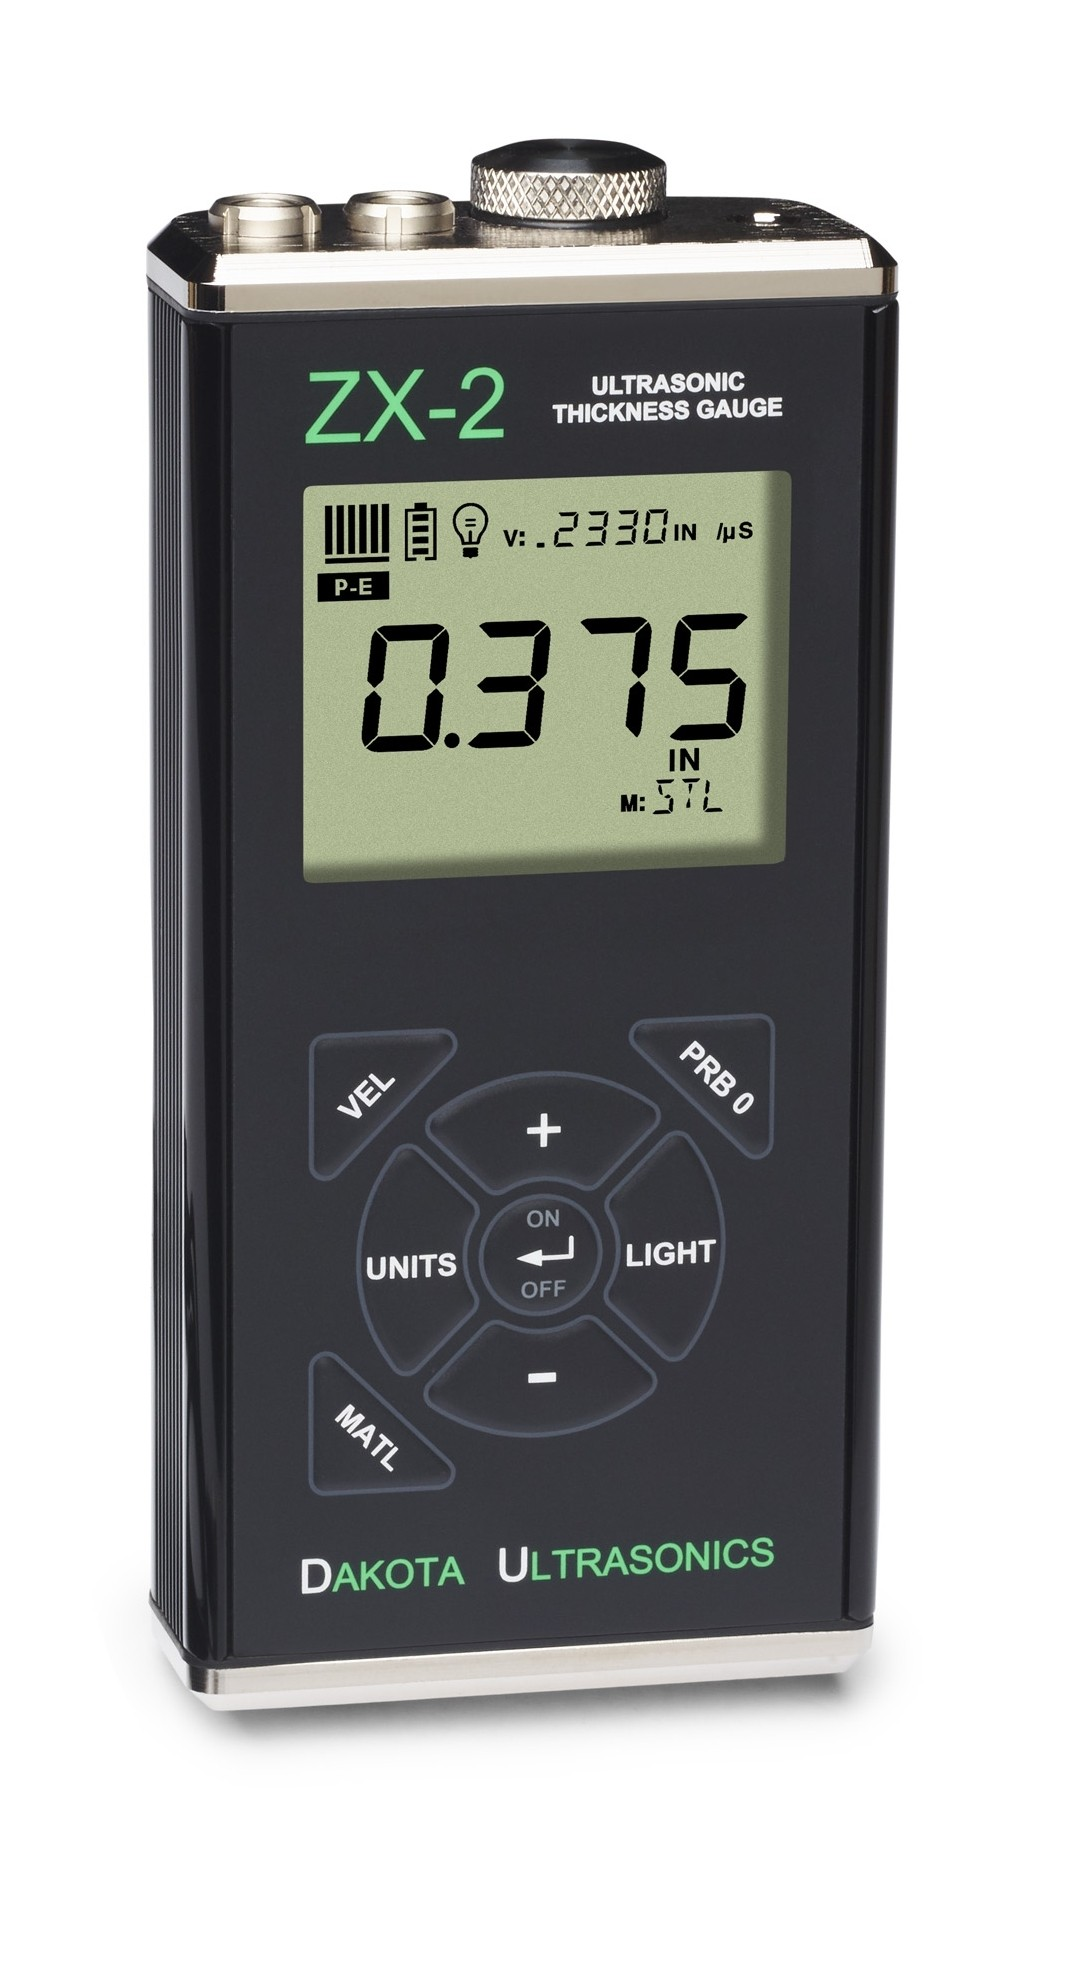 Dakota ZX-2 Ultrasonic Thickness Gauge